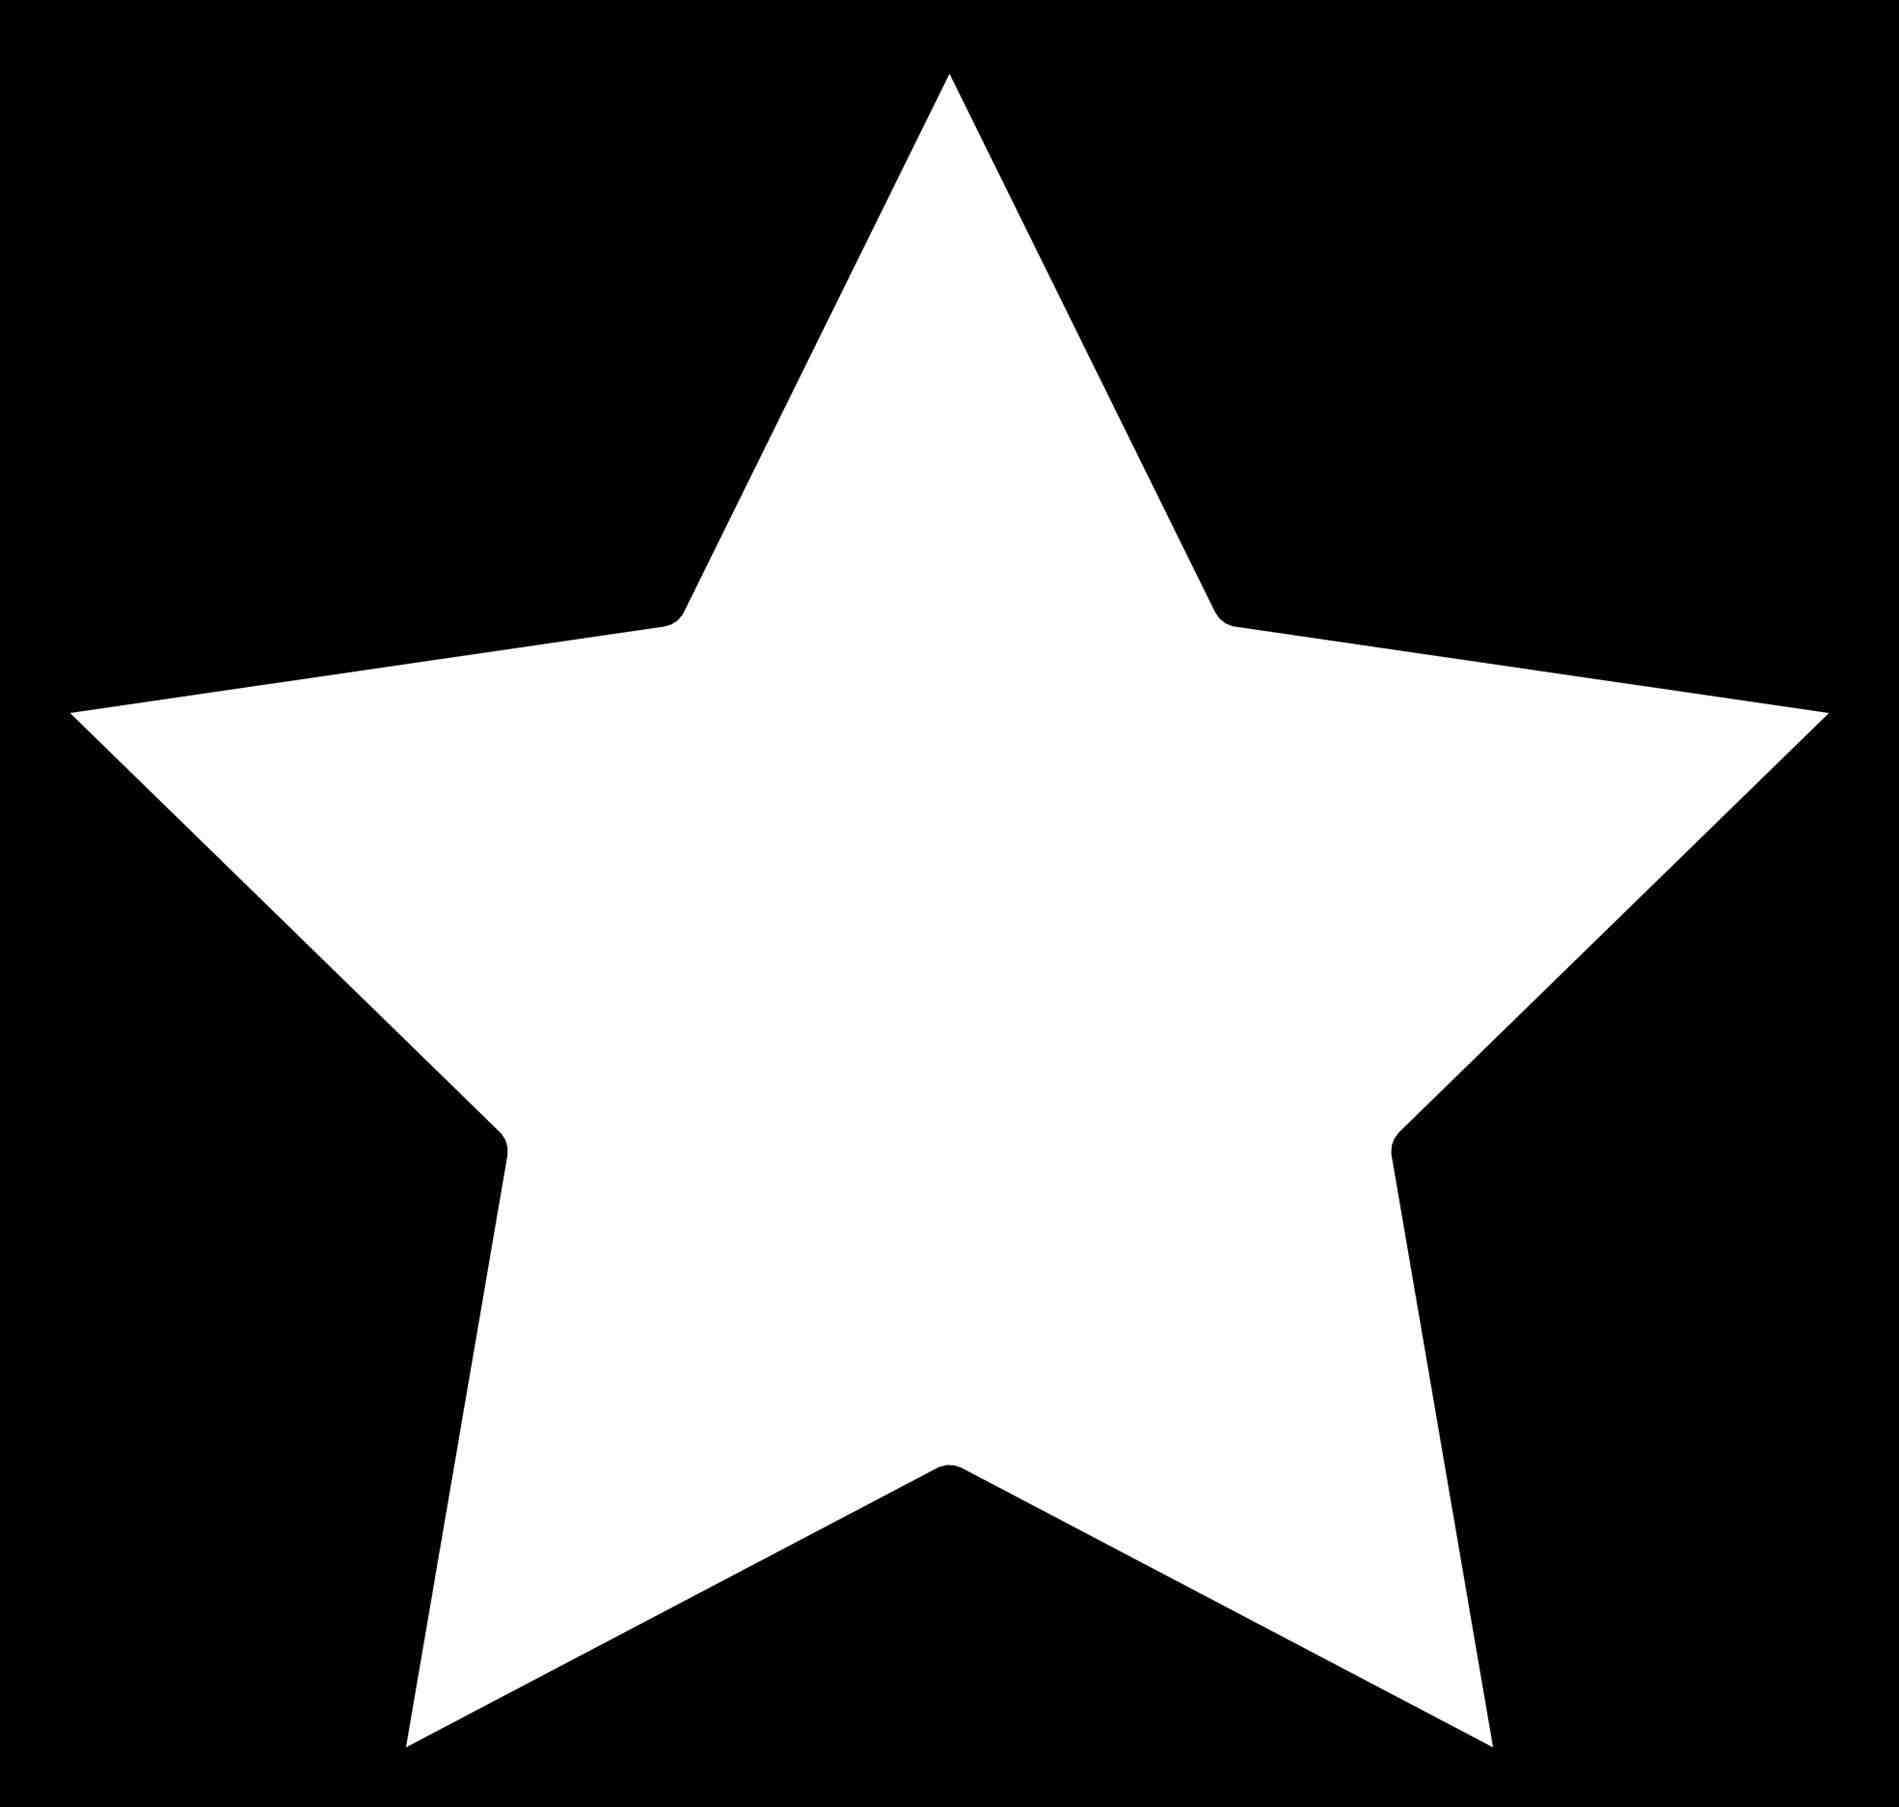 1899x1807 S Christmas Star Clip Art Black And White Snowman Snowflake